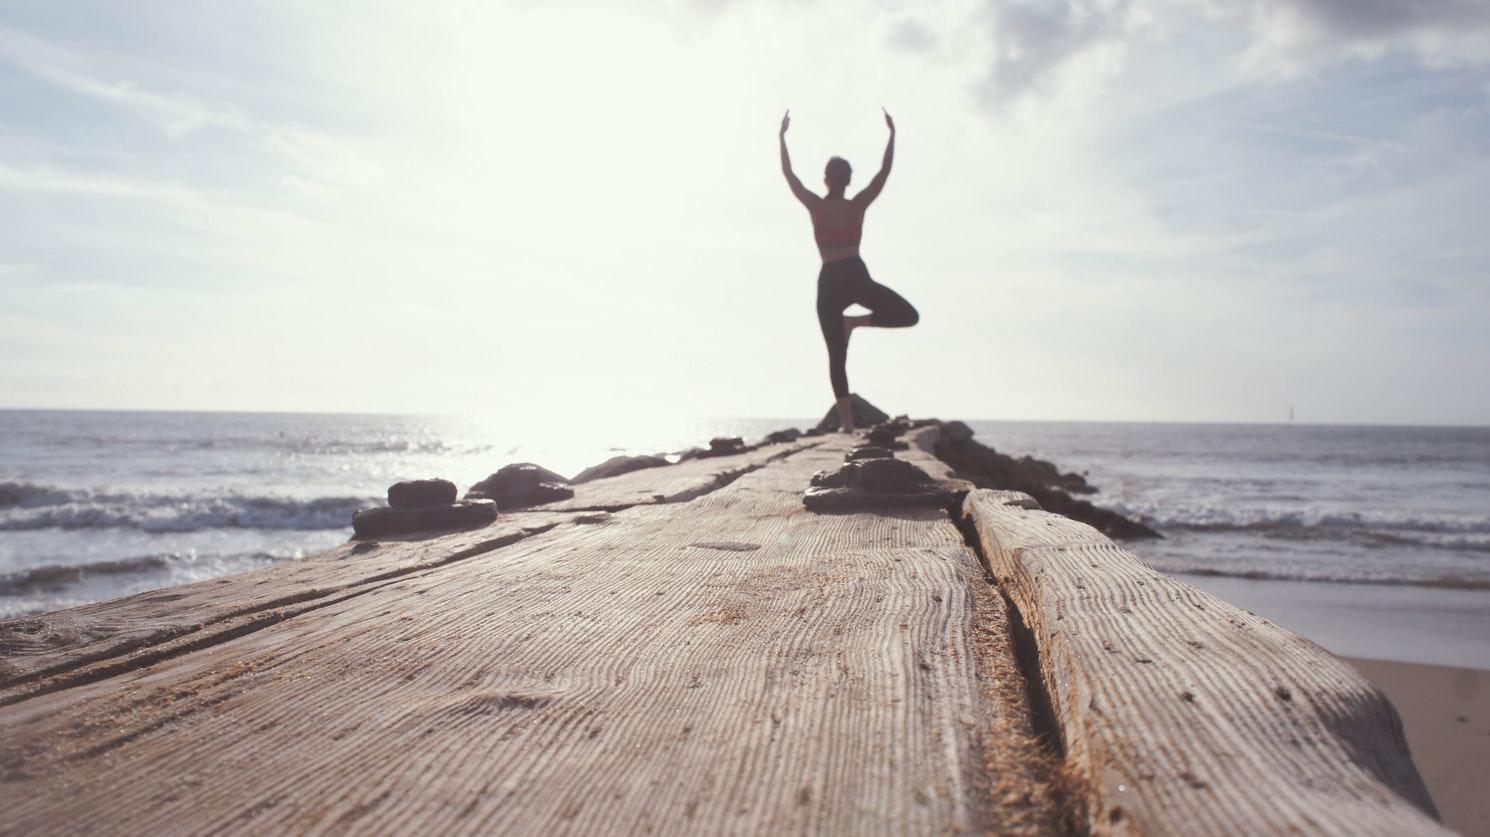 keeping up yoga while traveling